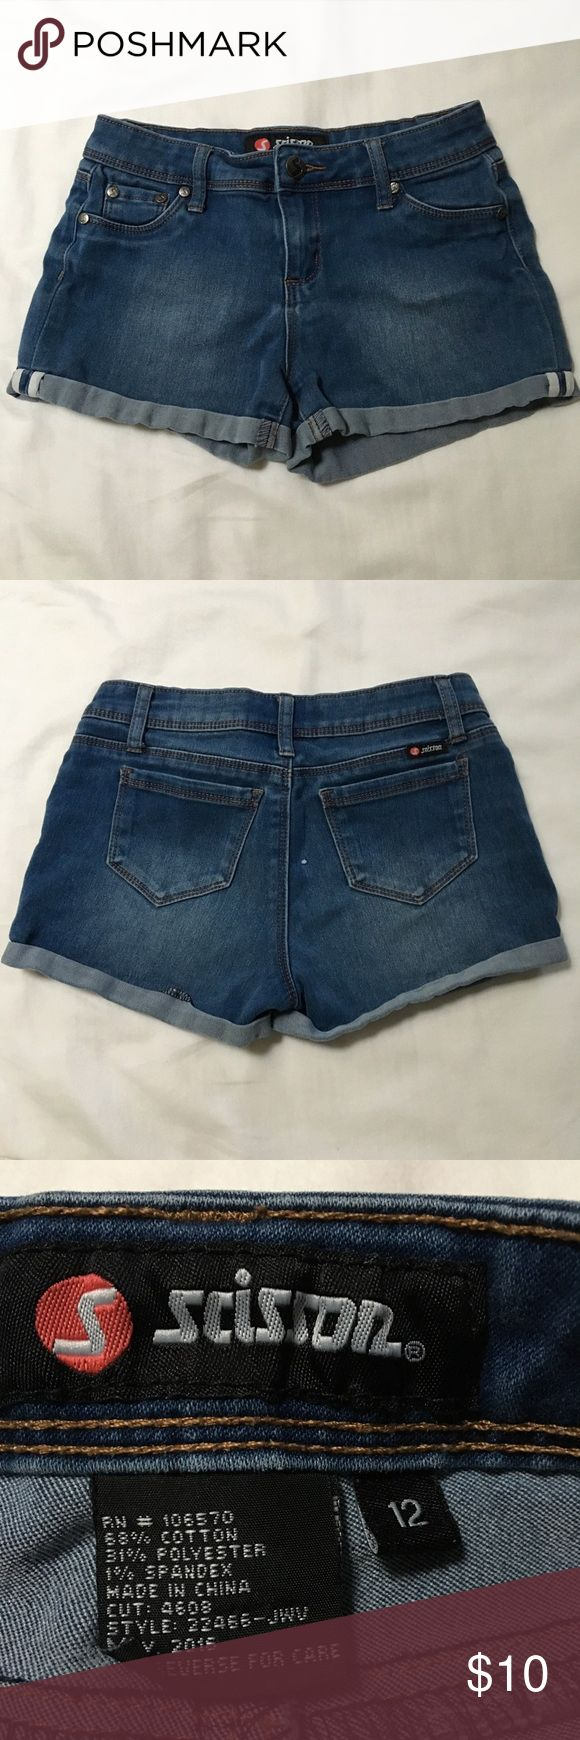 Girls Denim shorts Cute girls Scissor brand Denim shorts. Like new, no tags. Barely worn. Bottoms Shorts